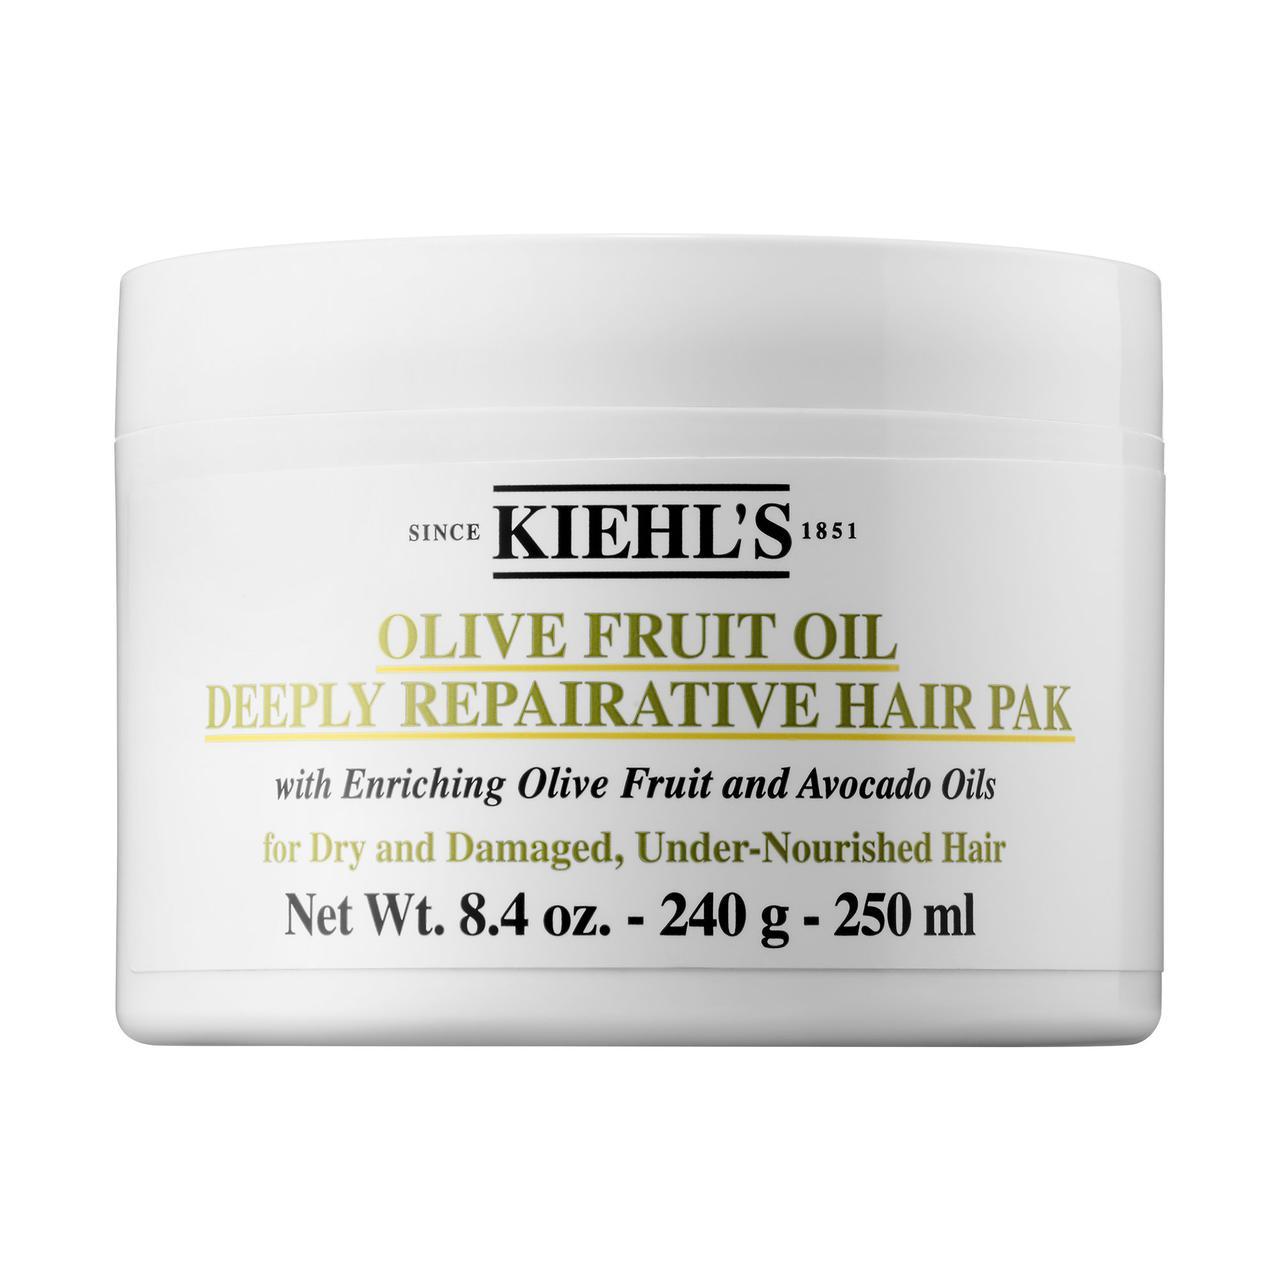 Маска для глубокого восстановления волос Kiehl's Olive Fruit Oil Deeply Repairative Hair Pak